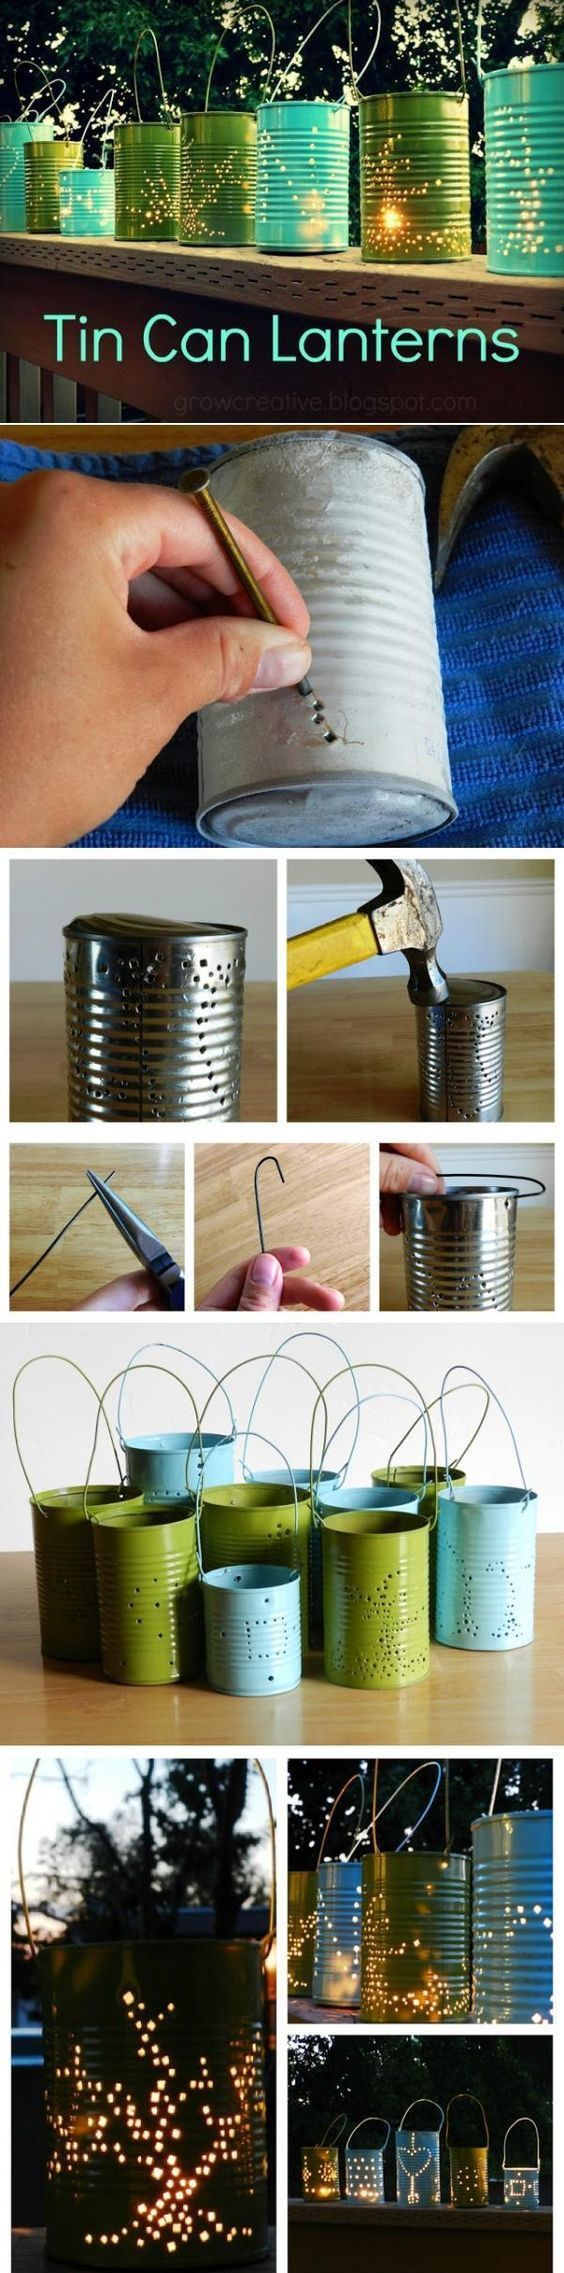 DIY Tin Can Lanterns Craft